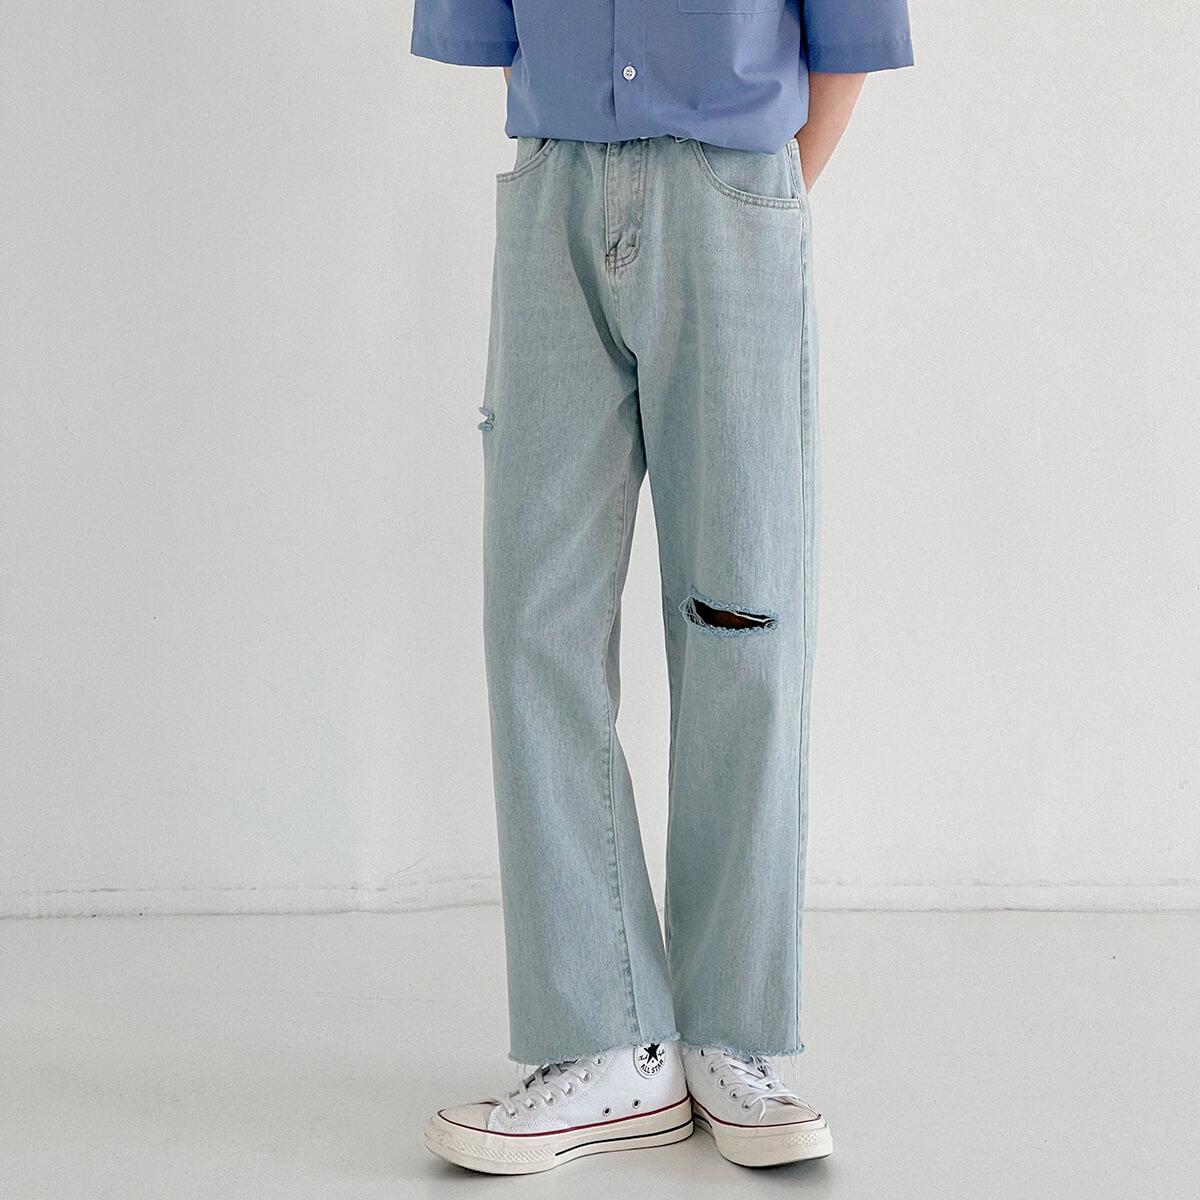 Джинсы DAZO Studio Jeans Torn Knee Raw Material Bottom (2)